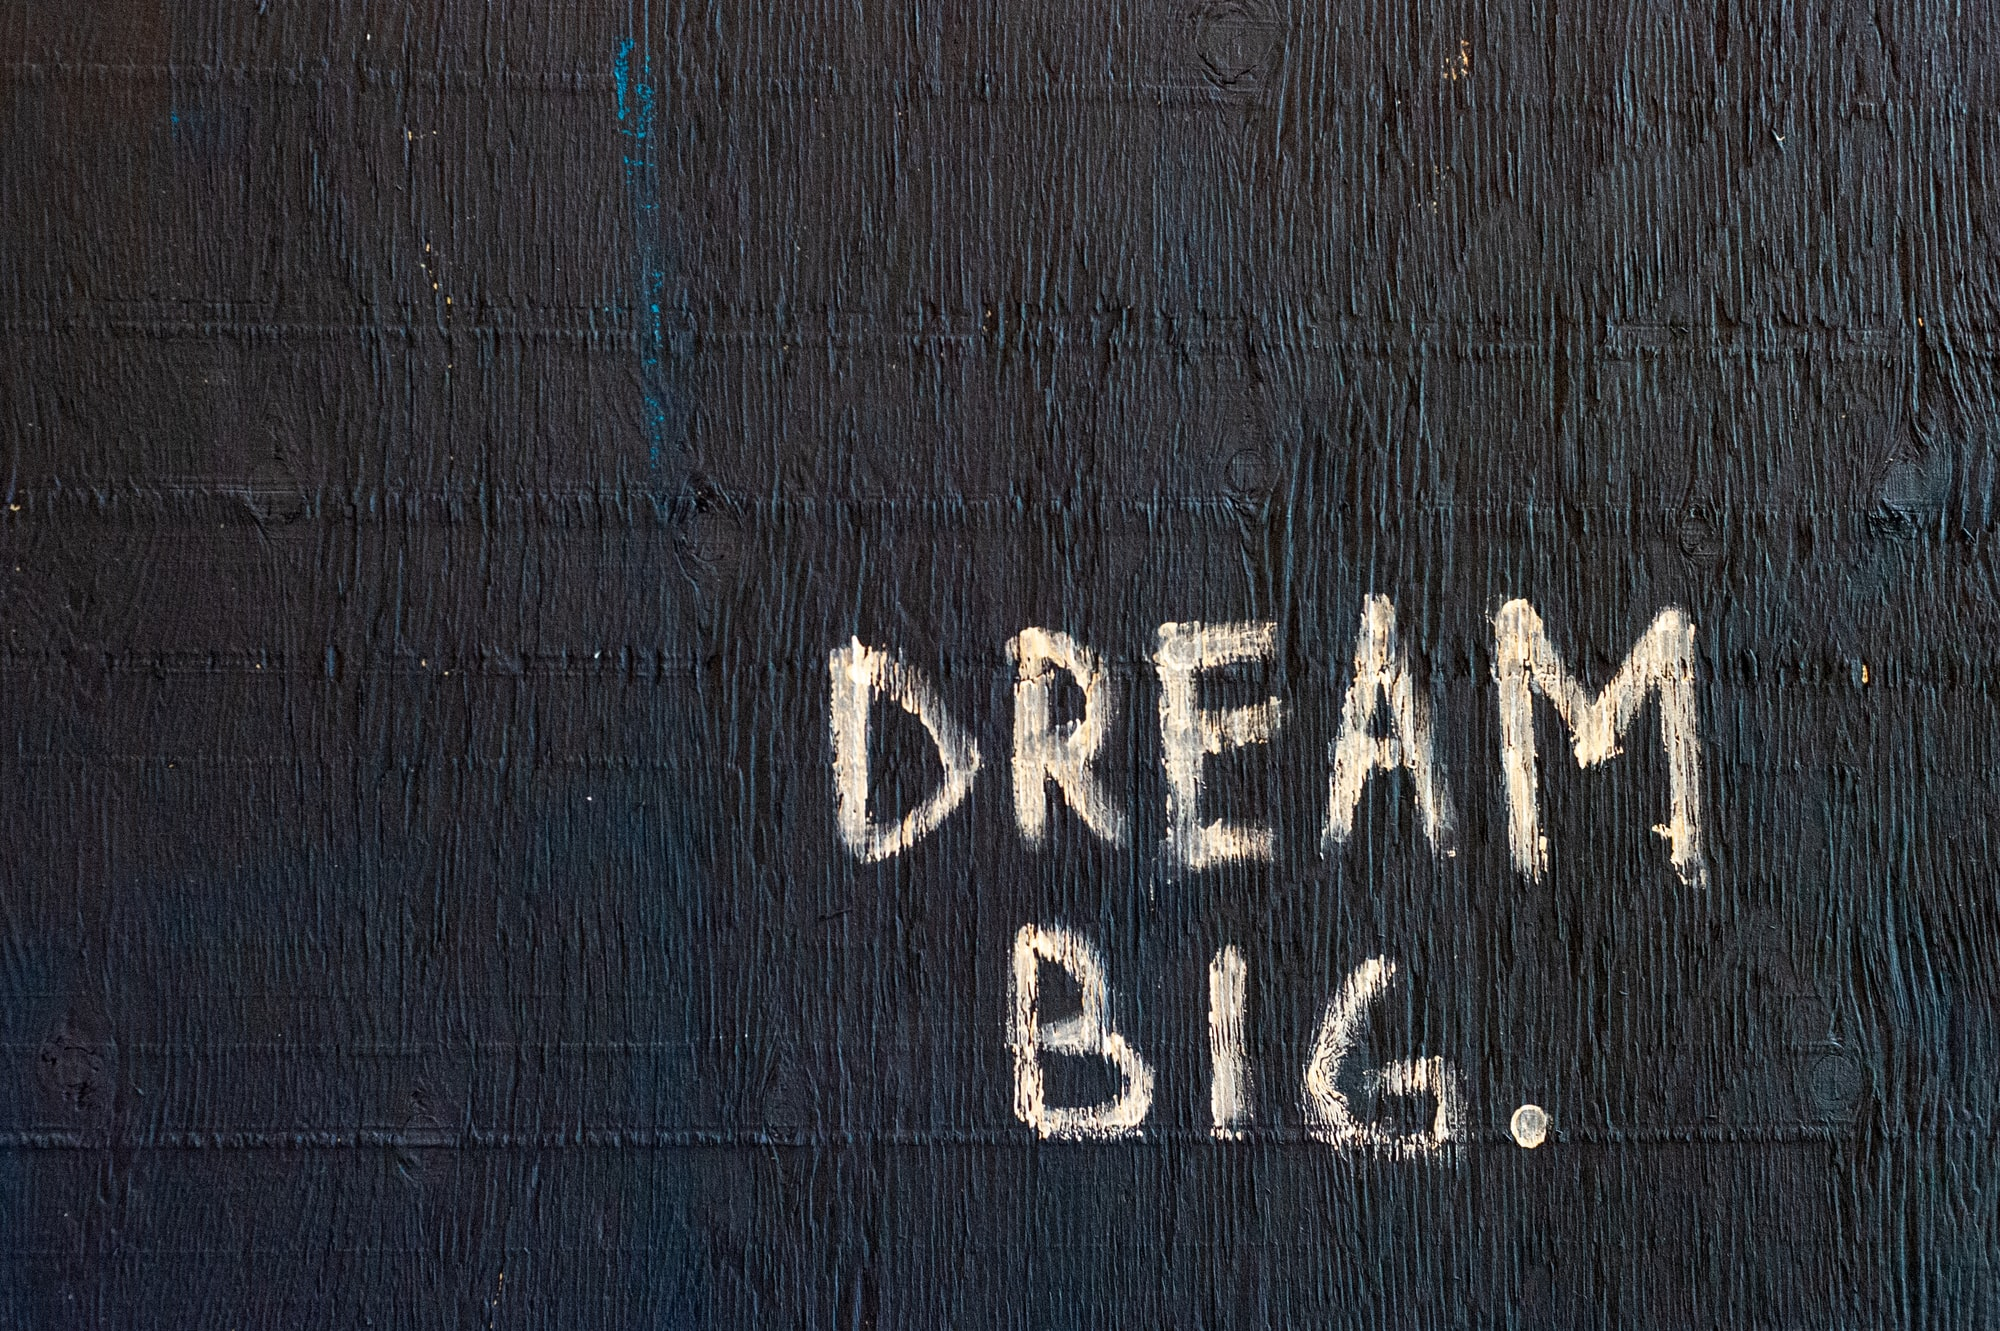 Dreams: An Introduction